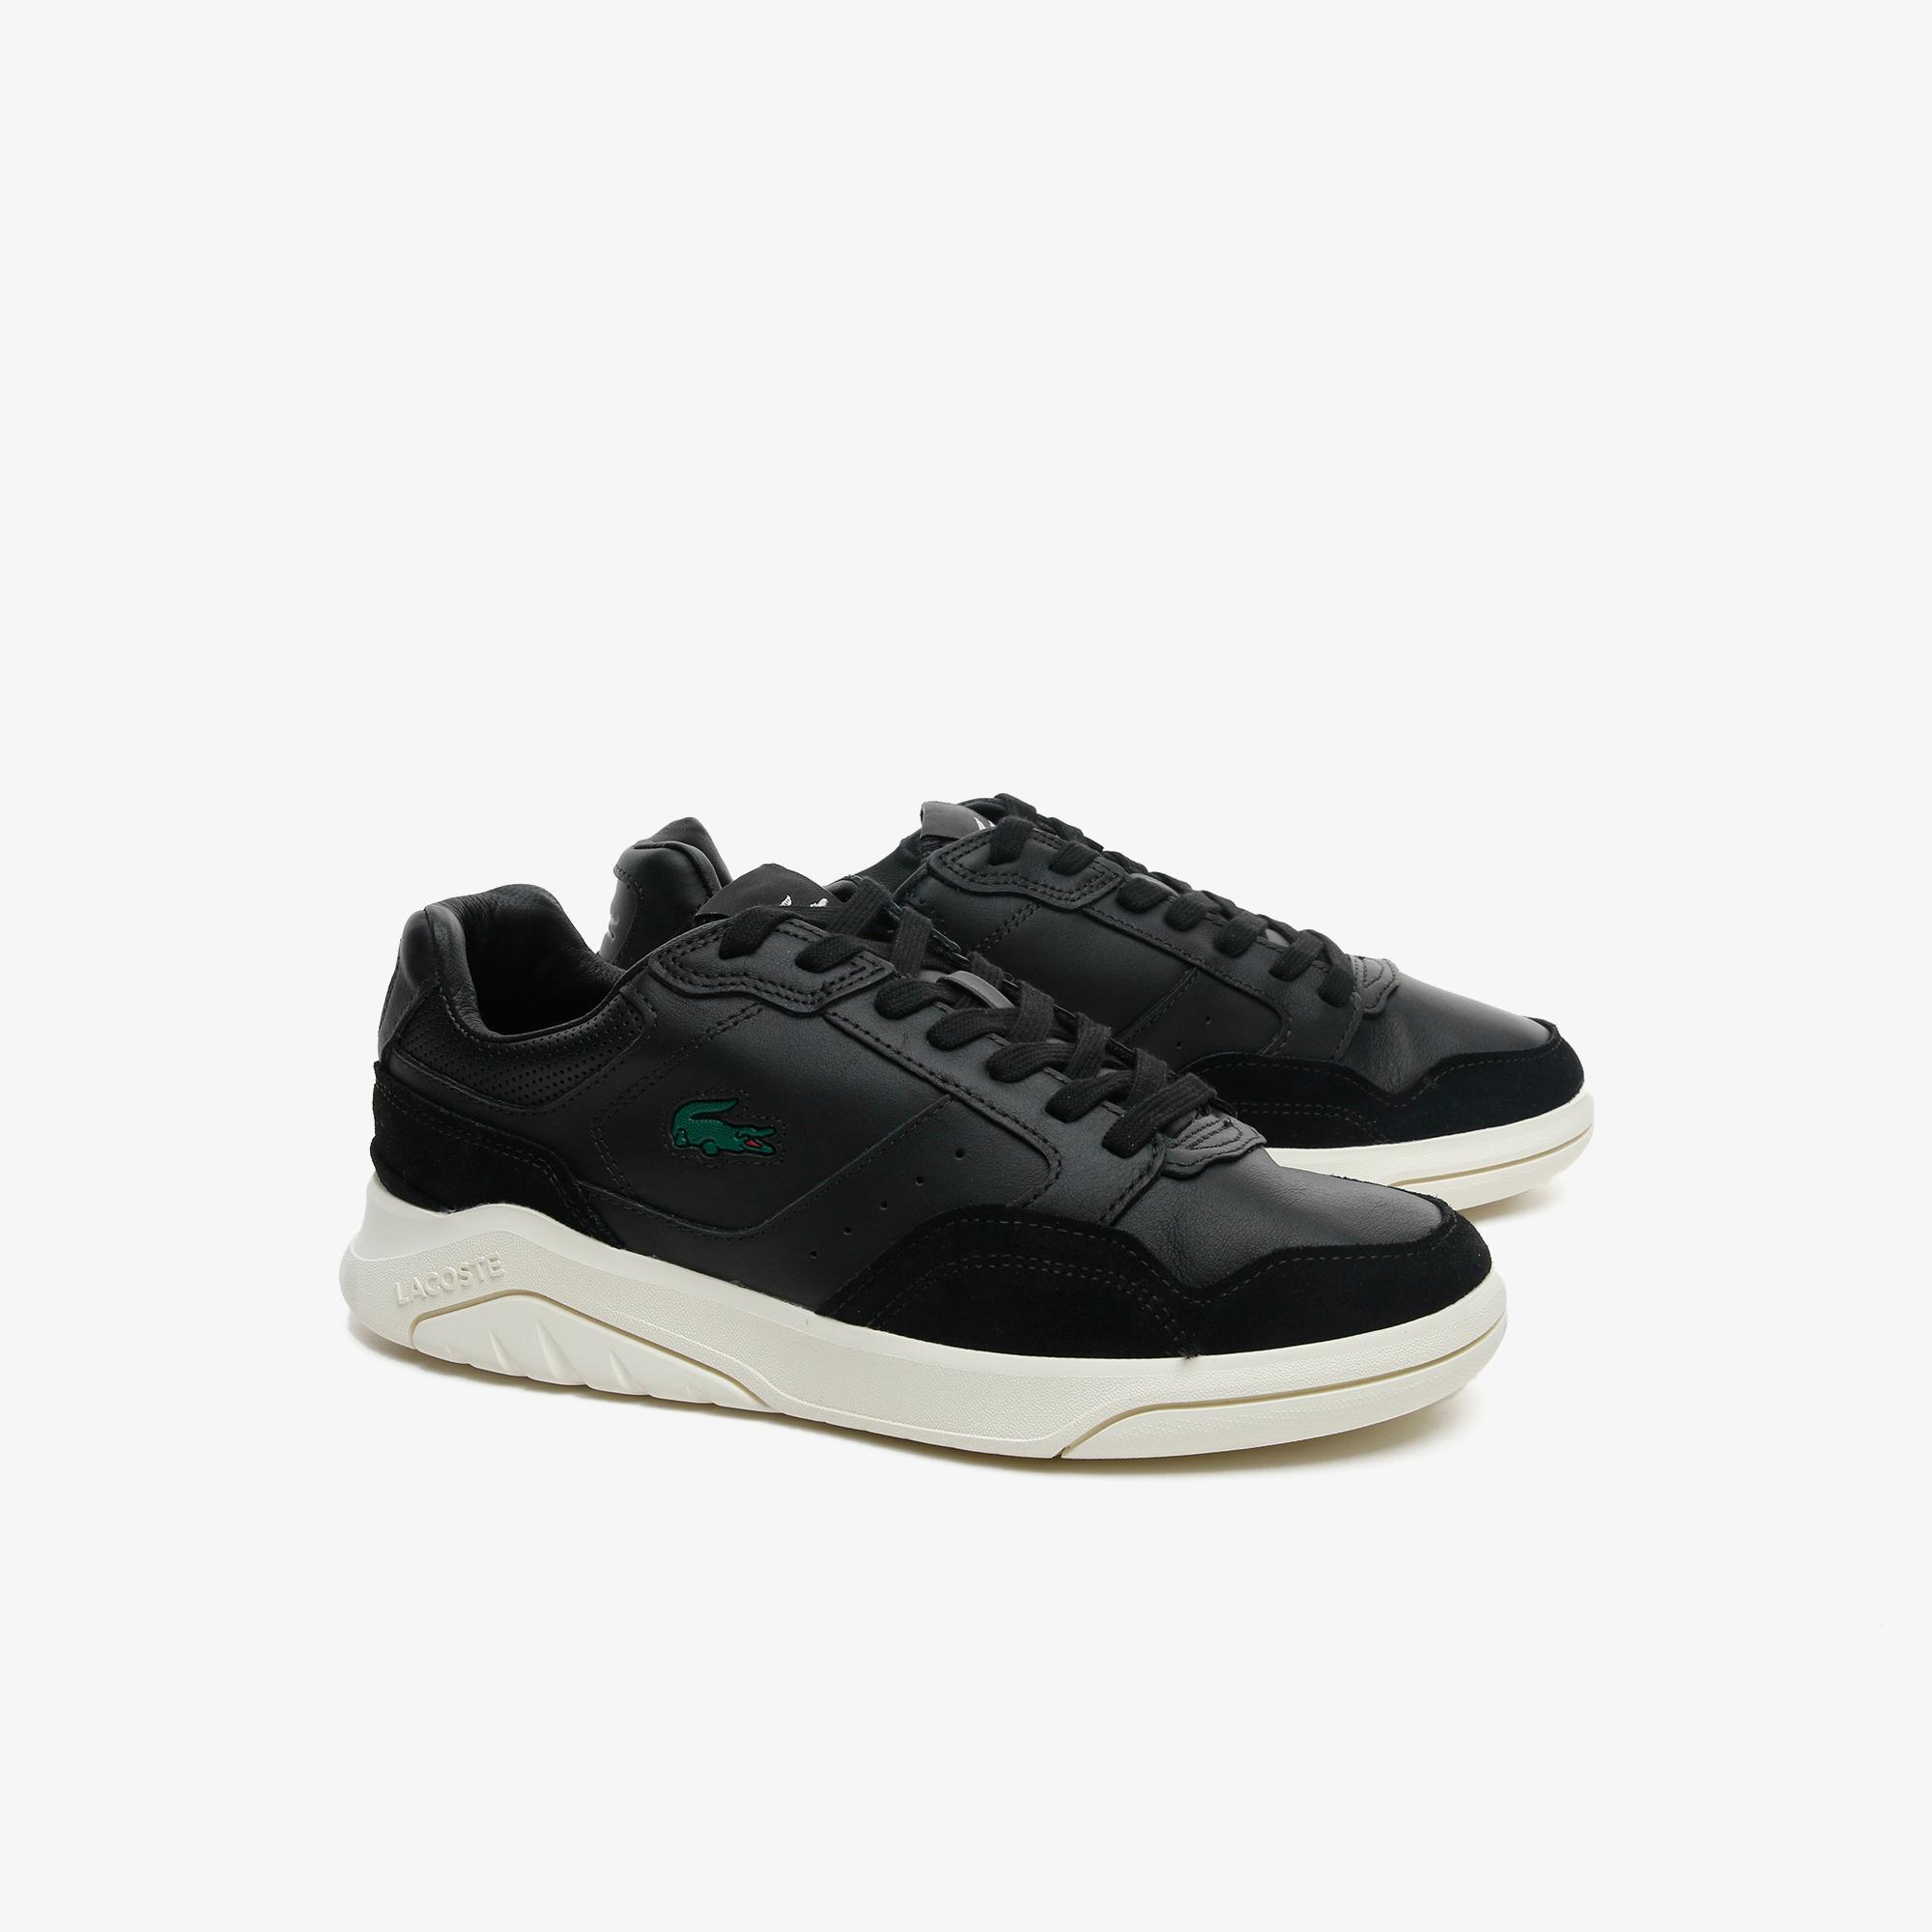 Lacoste Game Advance Luxe07211Sma Erkek Siyah - Beyaz Sneaker